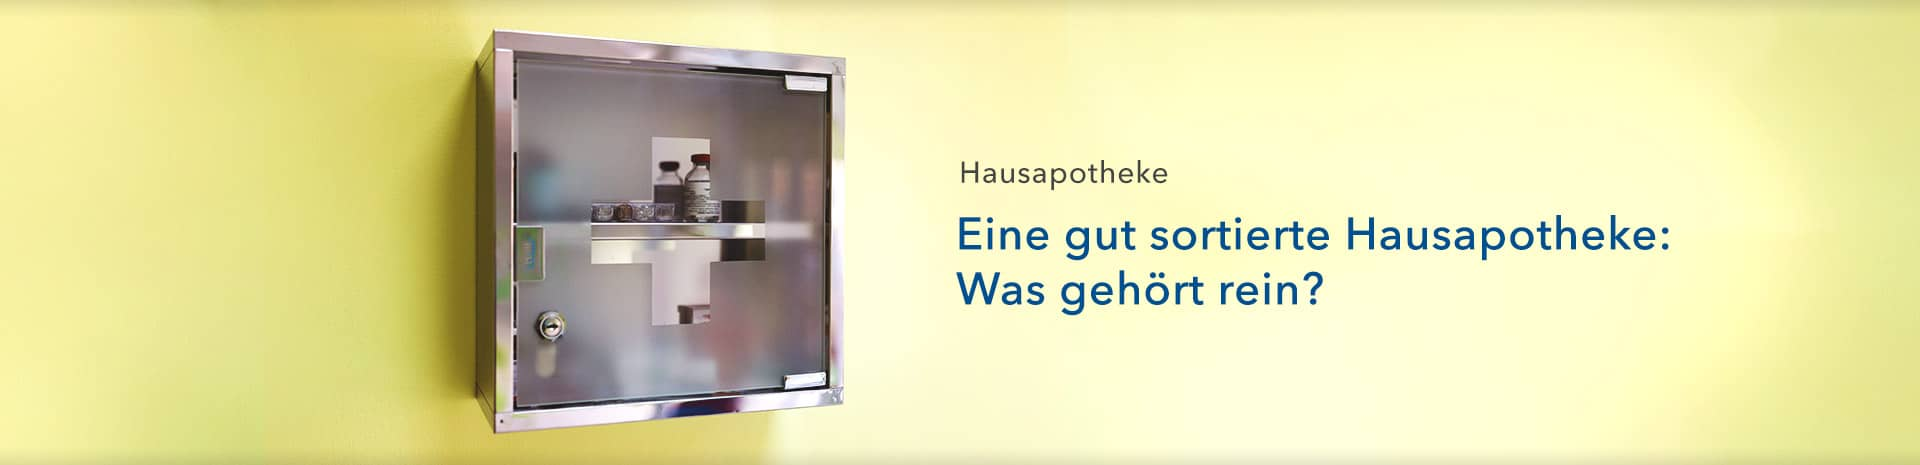 Hausapotheke - Ratgeber - shop-apotheke.com